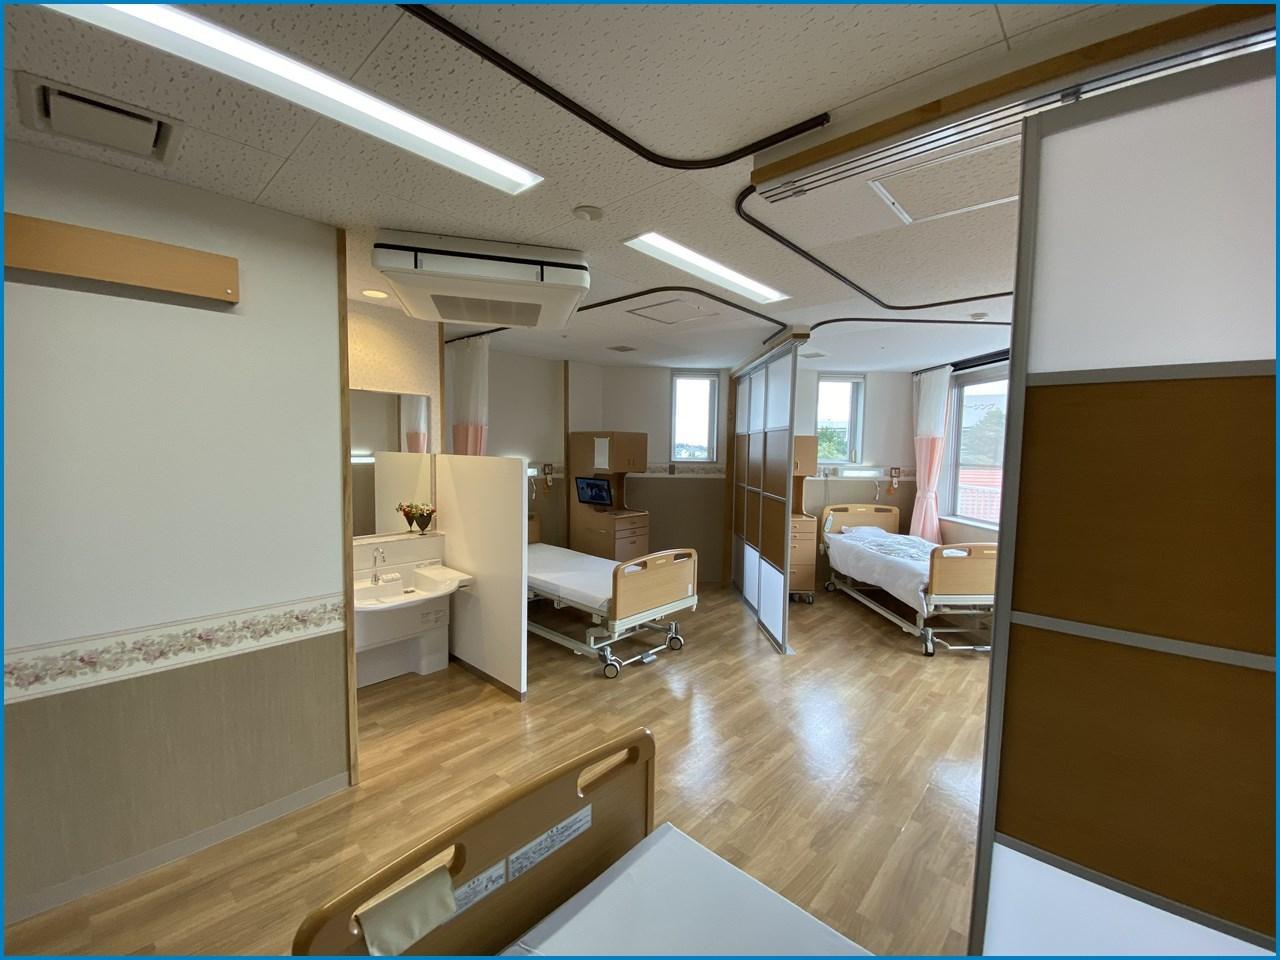 N病院グループ N病院東館 介護医療院転換改修工事 1_c0376508_16020114.jpg